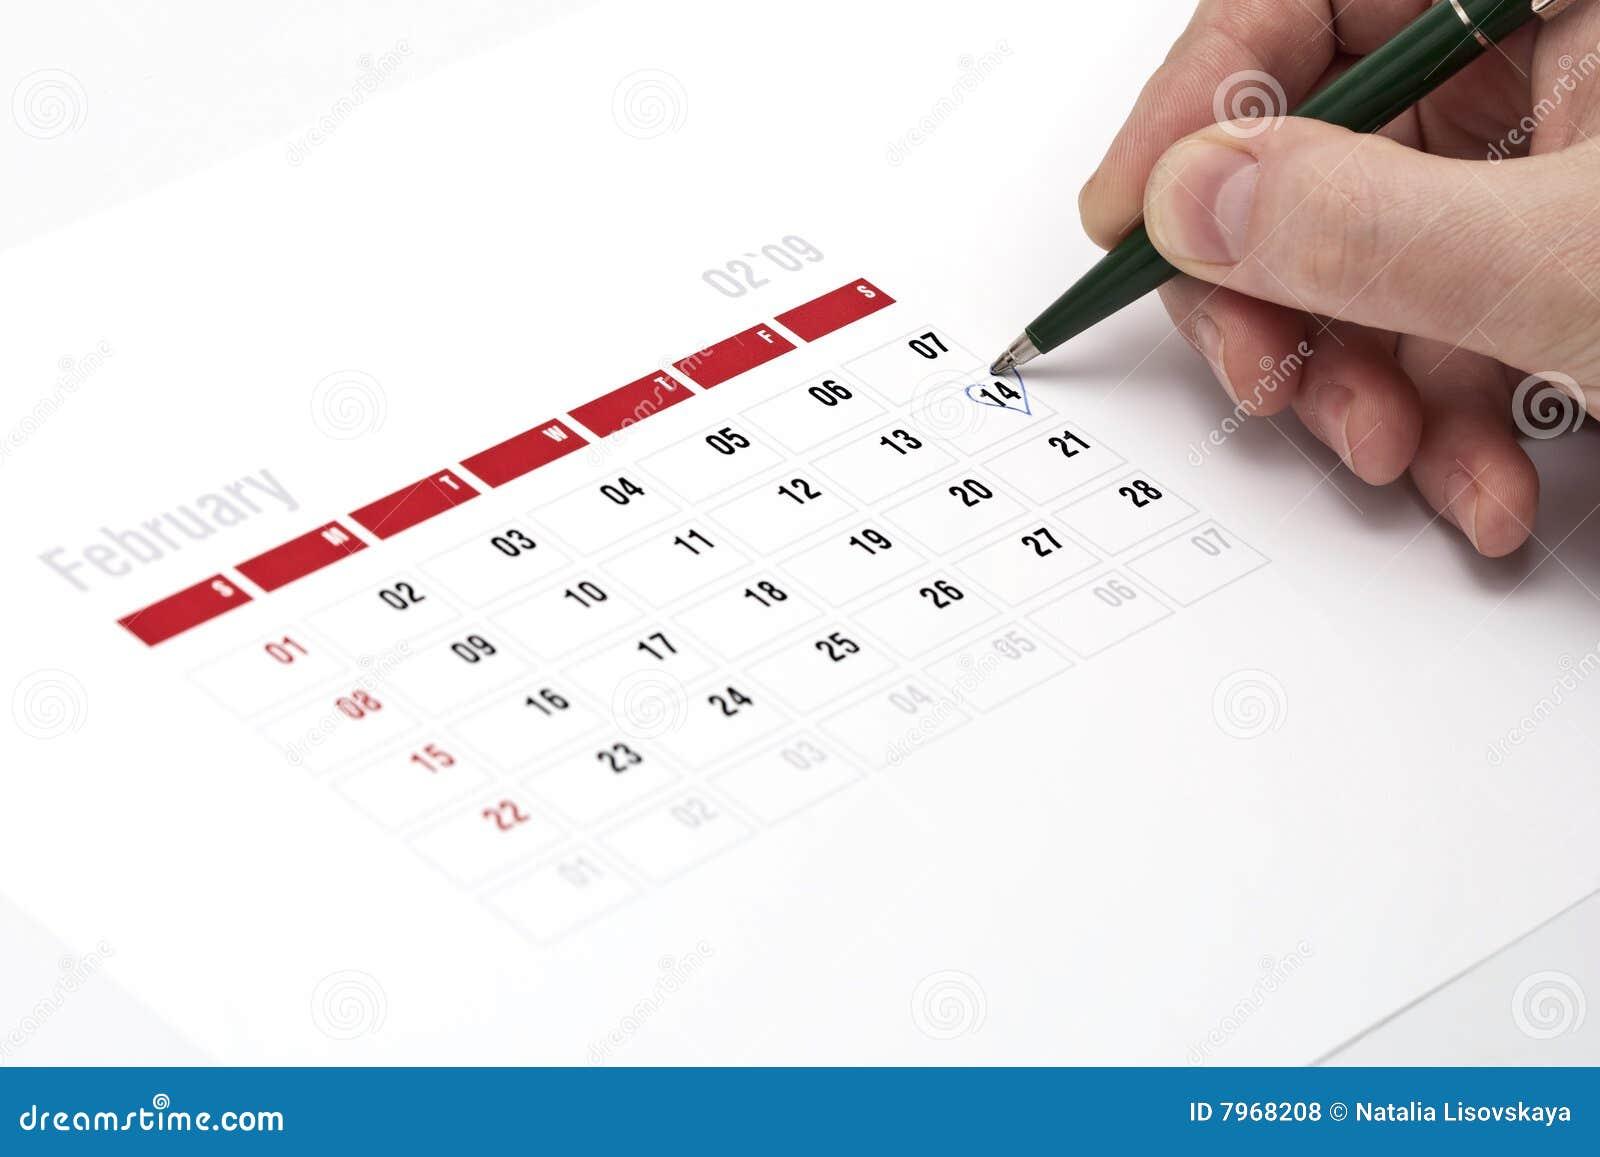 Calendar Wallpaper With Reminder : Calendar reminder stock photo image of dating